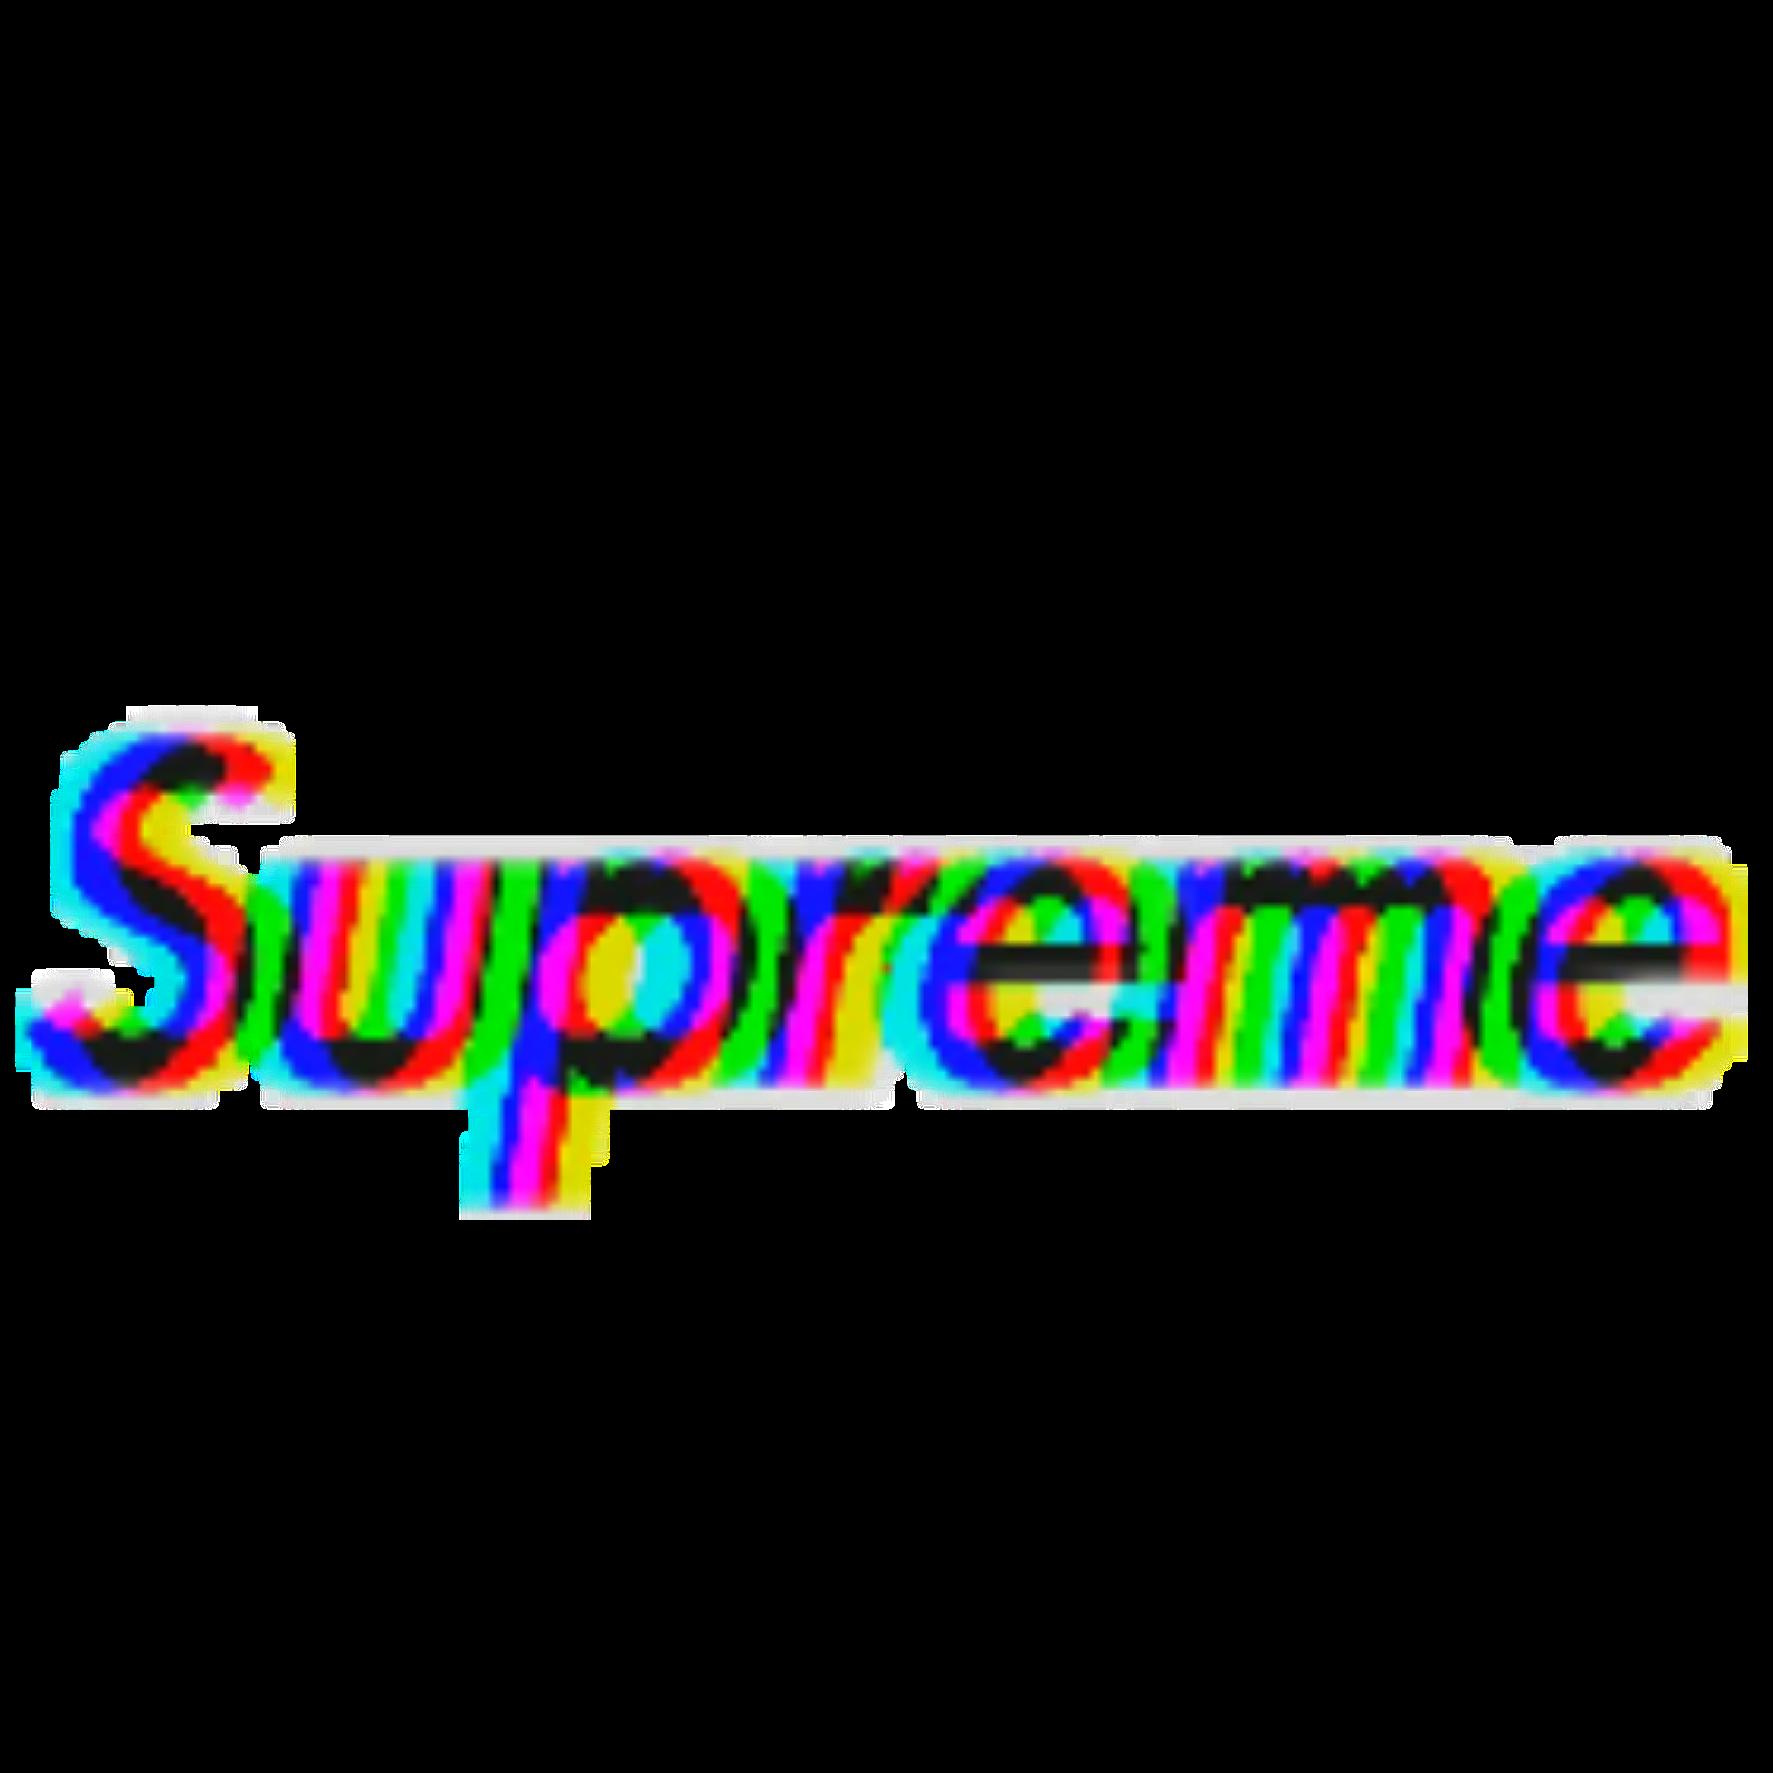 Transparent Supreme Logo PNG Images, Free Downloads - Free ...